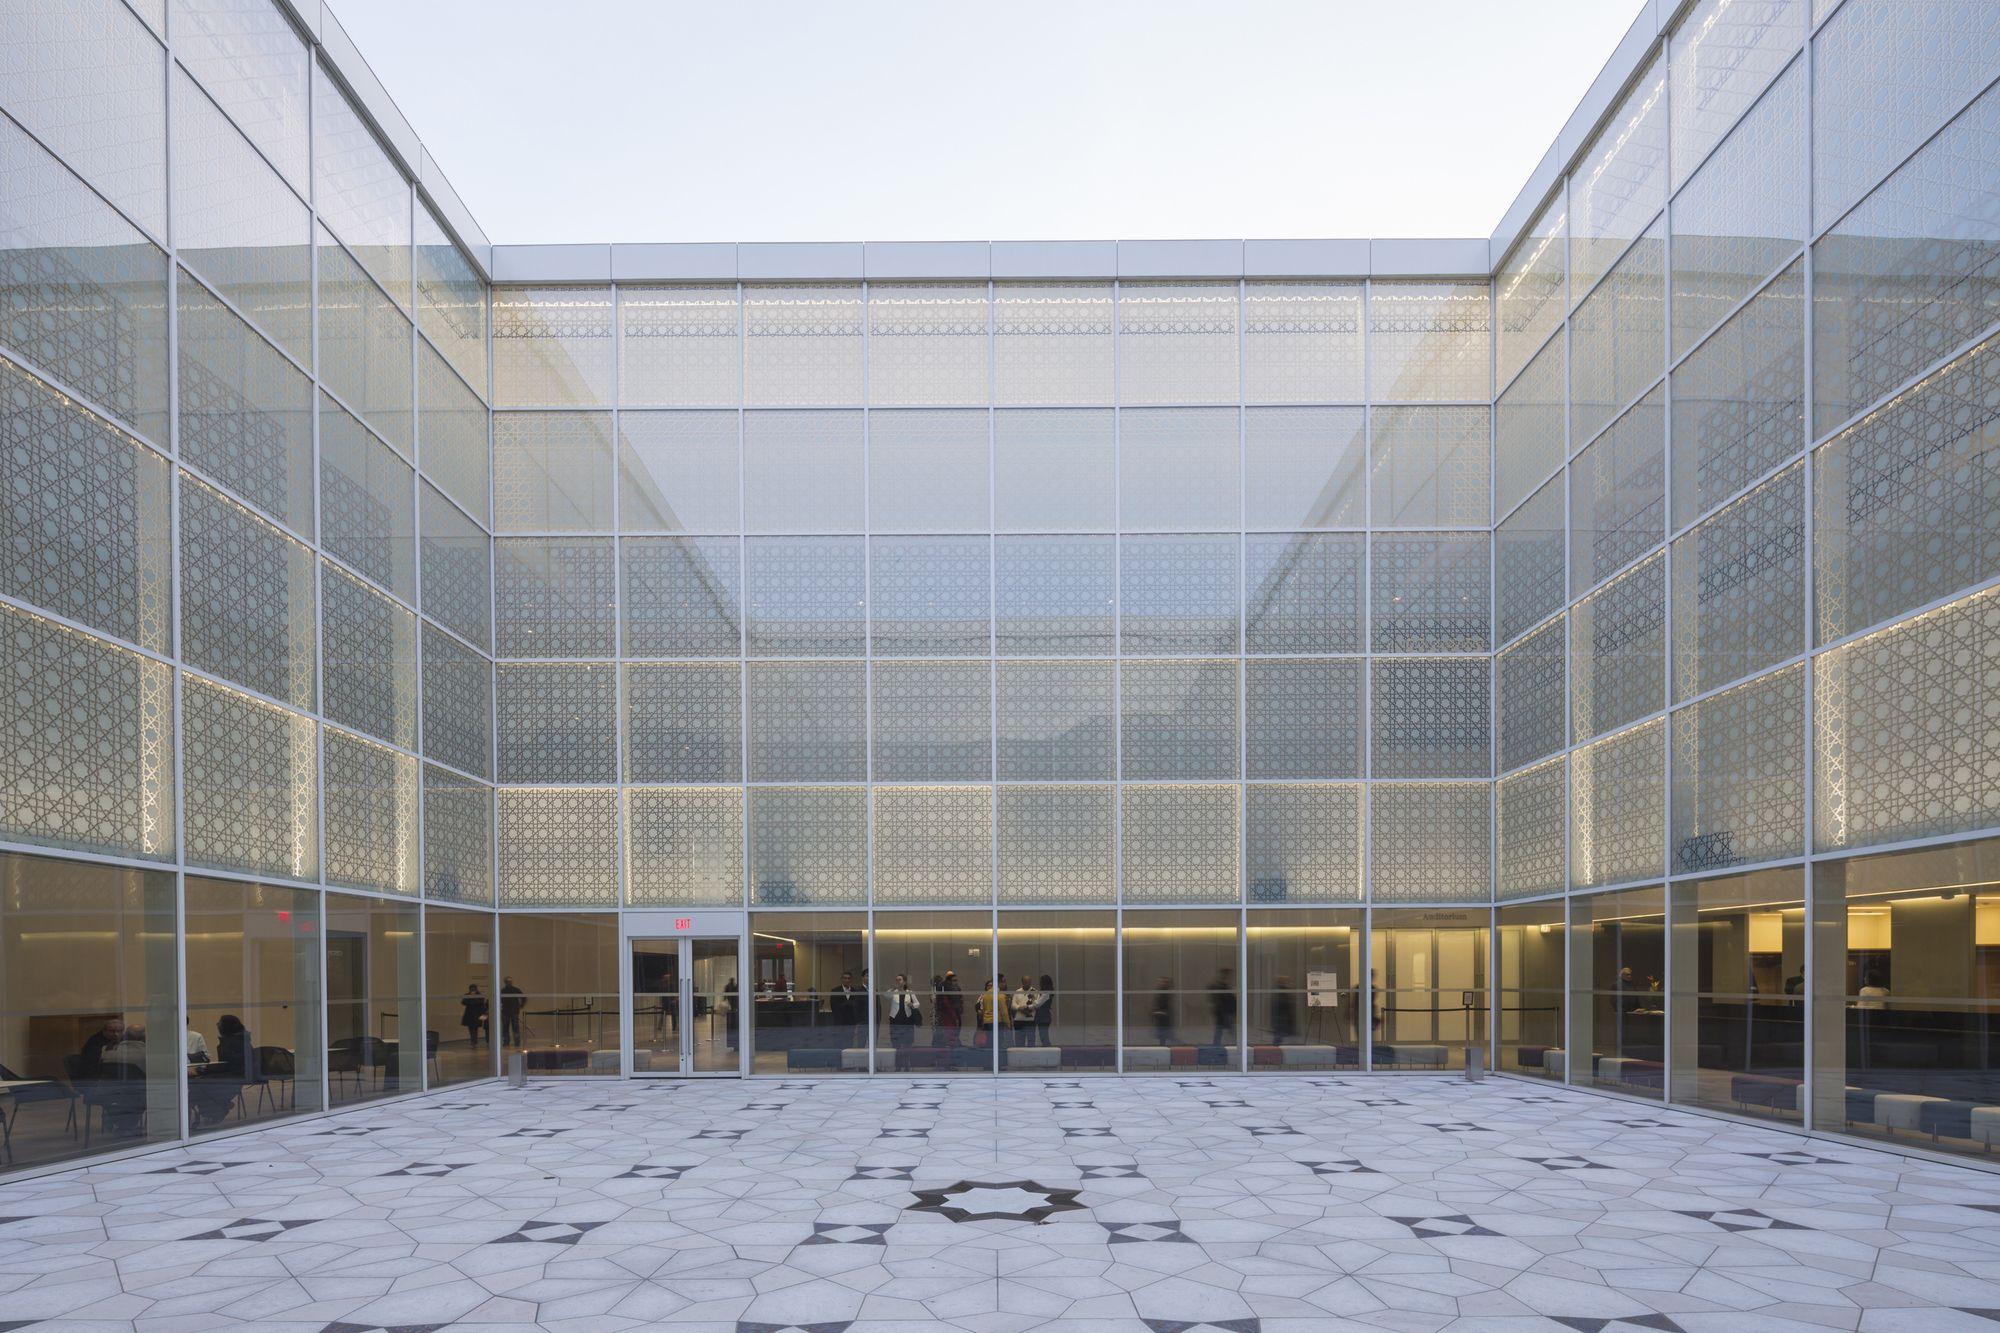 Aga Khan Museum Moriyama Teshima Architects Maki And Associates Arch2o Com